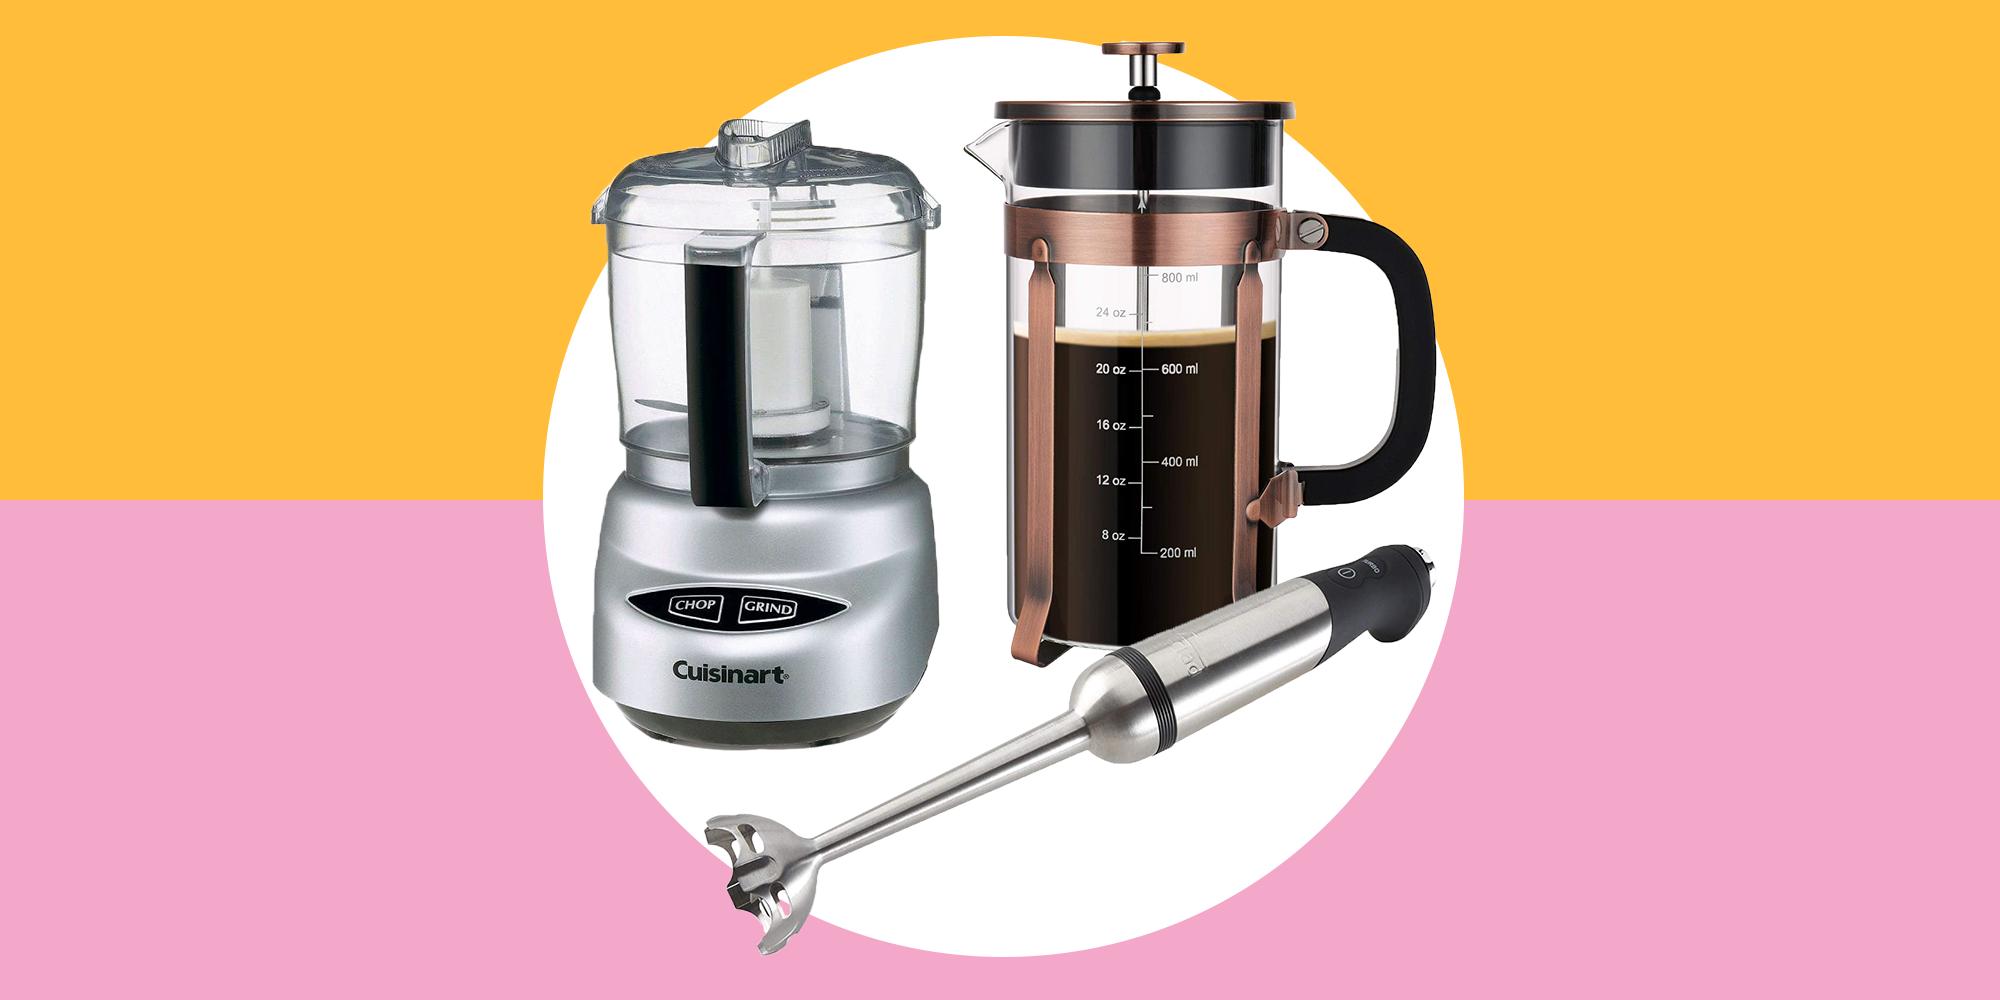 31 Cool Kitchen Gadgets That Make Cooking Way More Fun